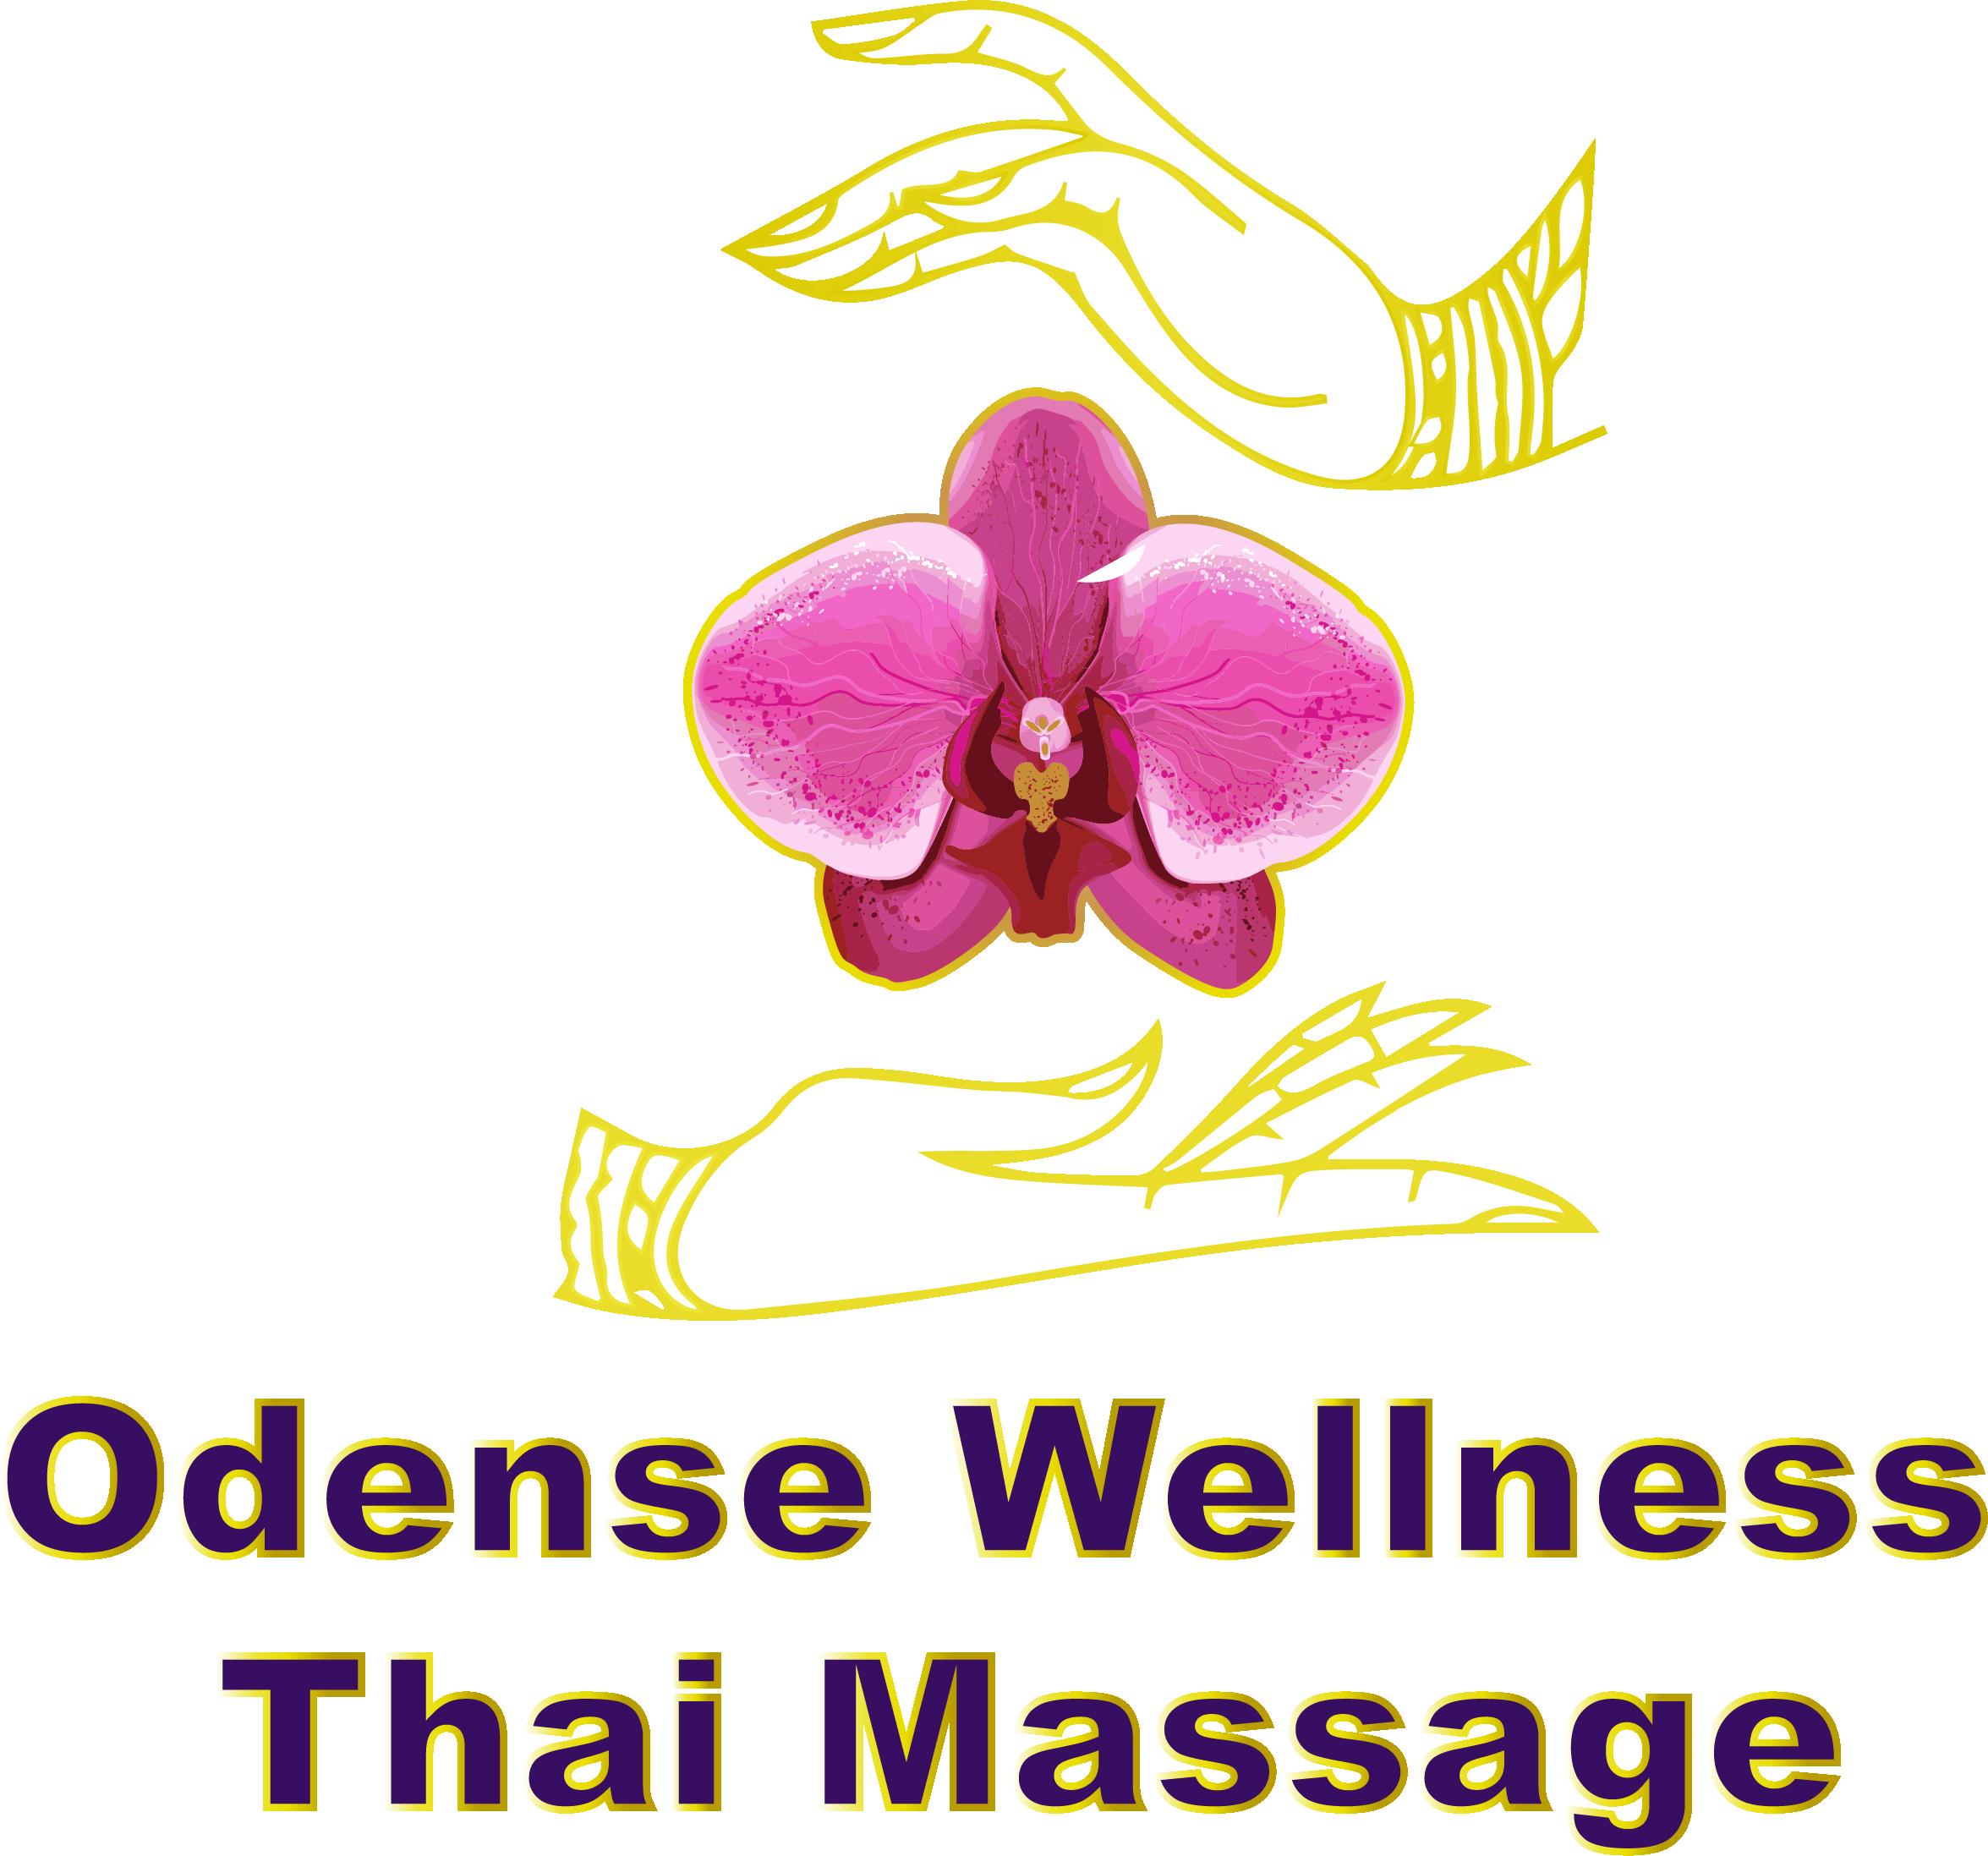 Odense Wellness